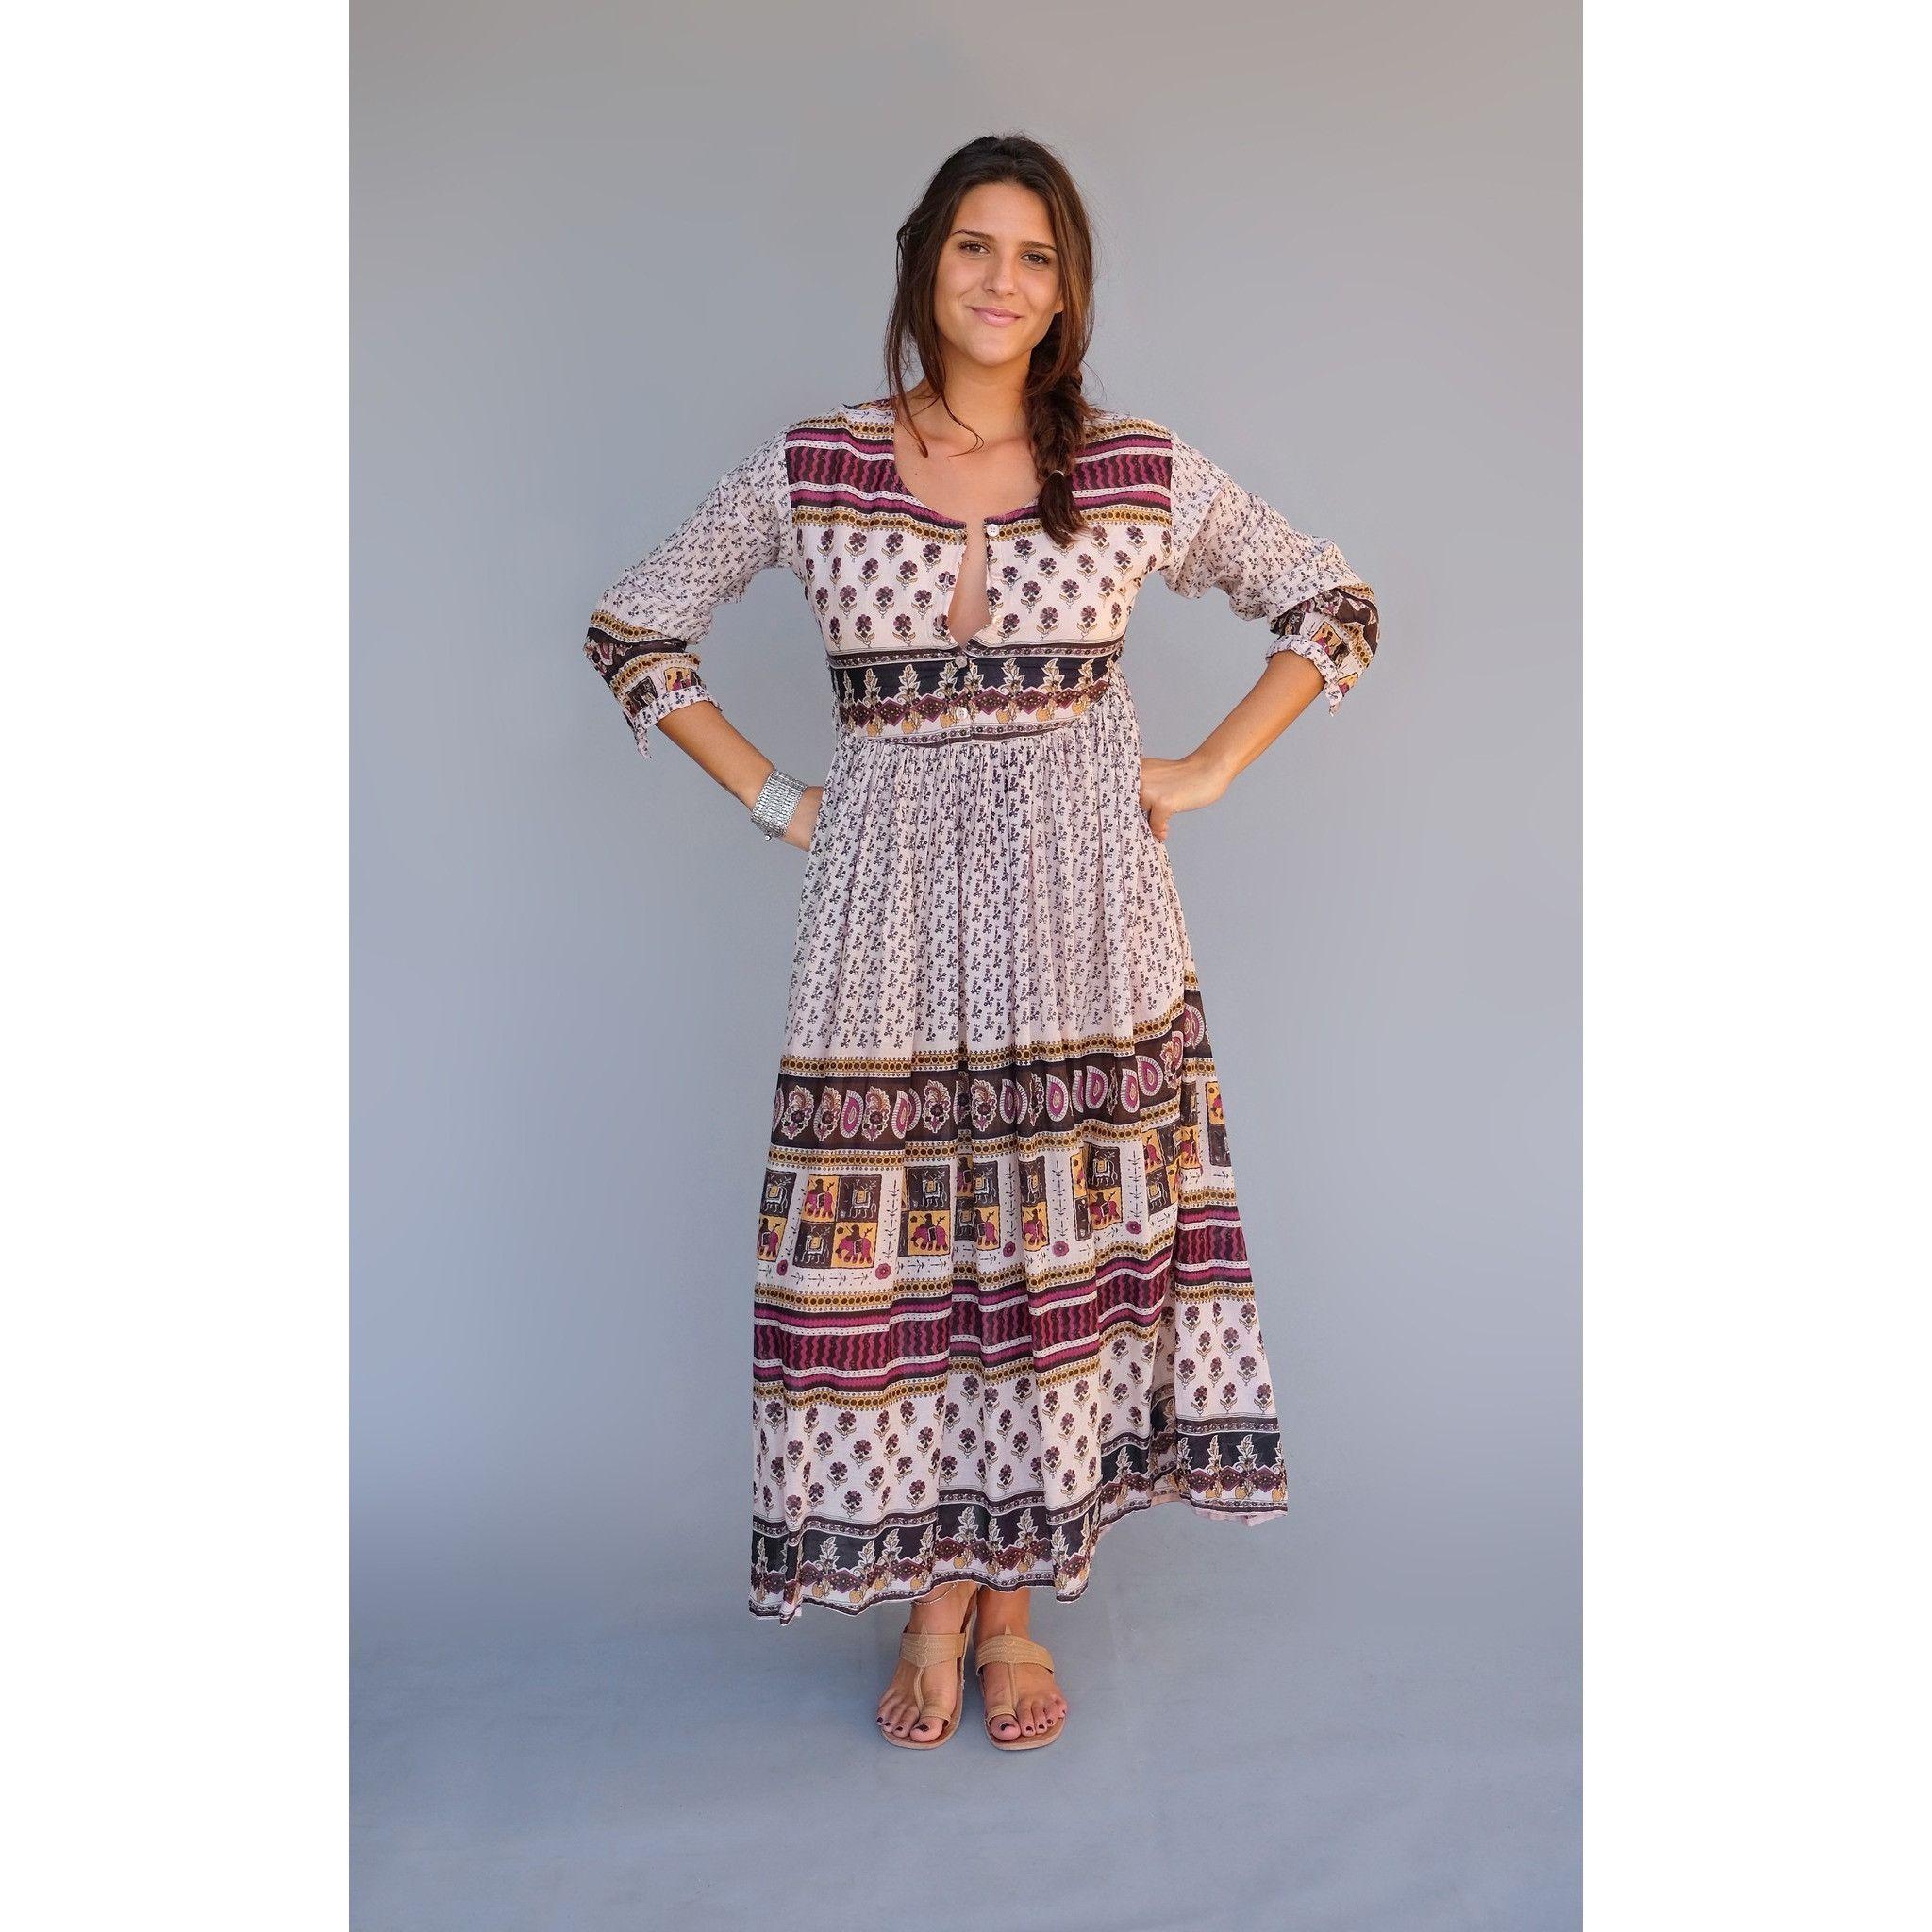 Coachella dress coachella dress and products